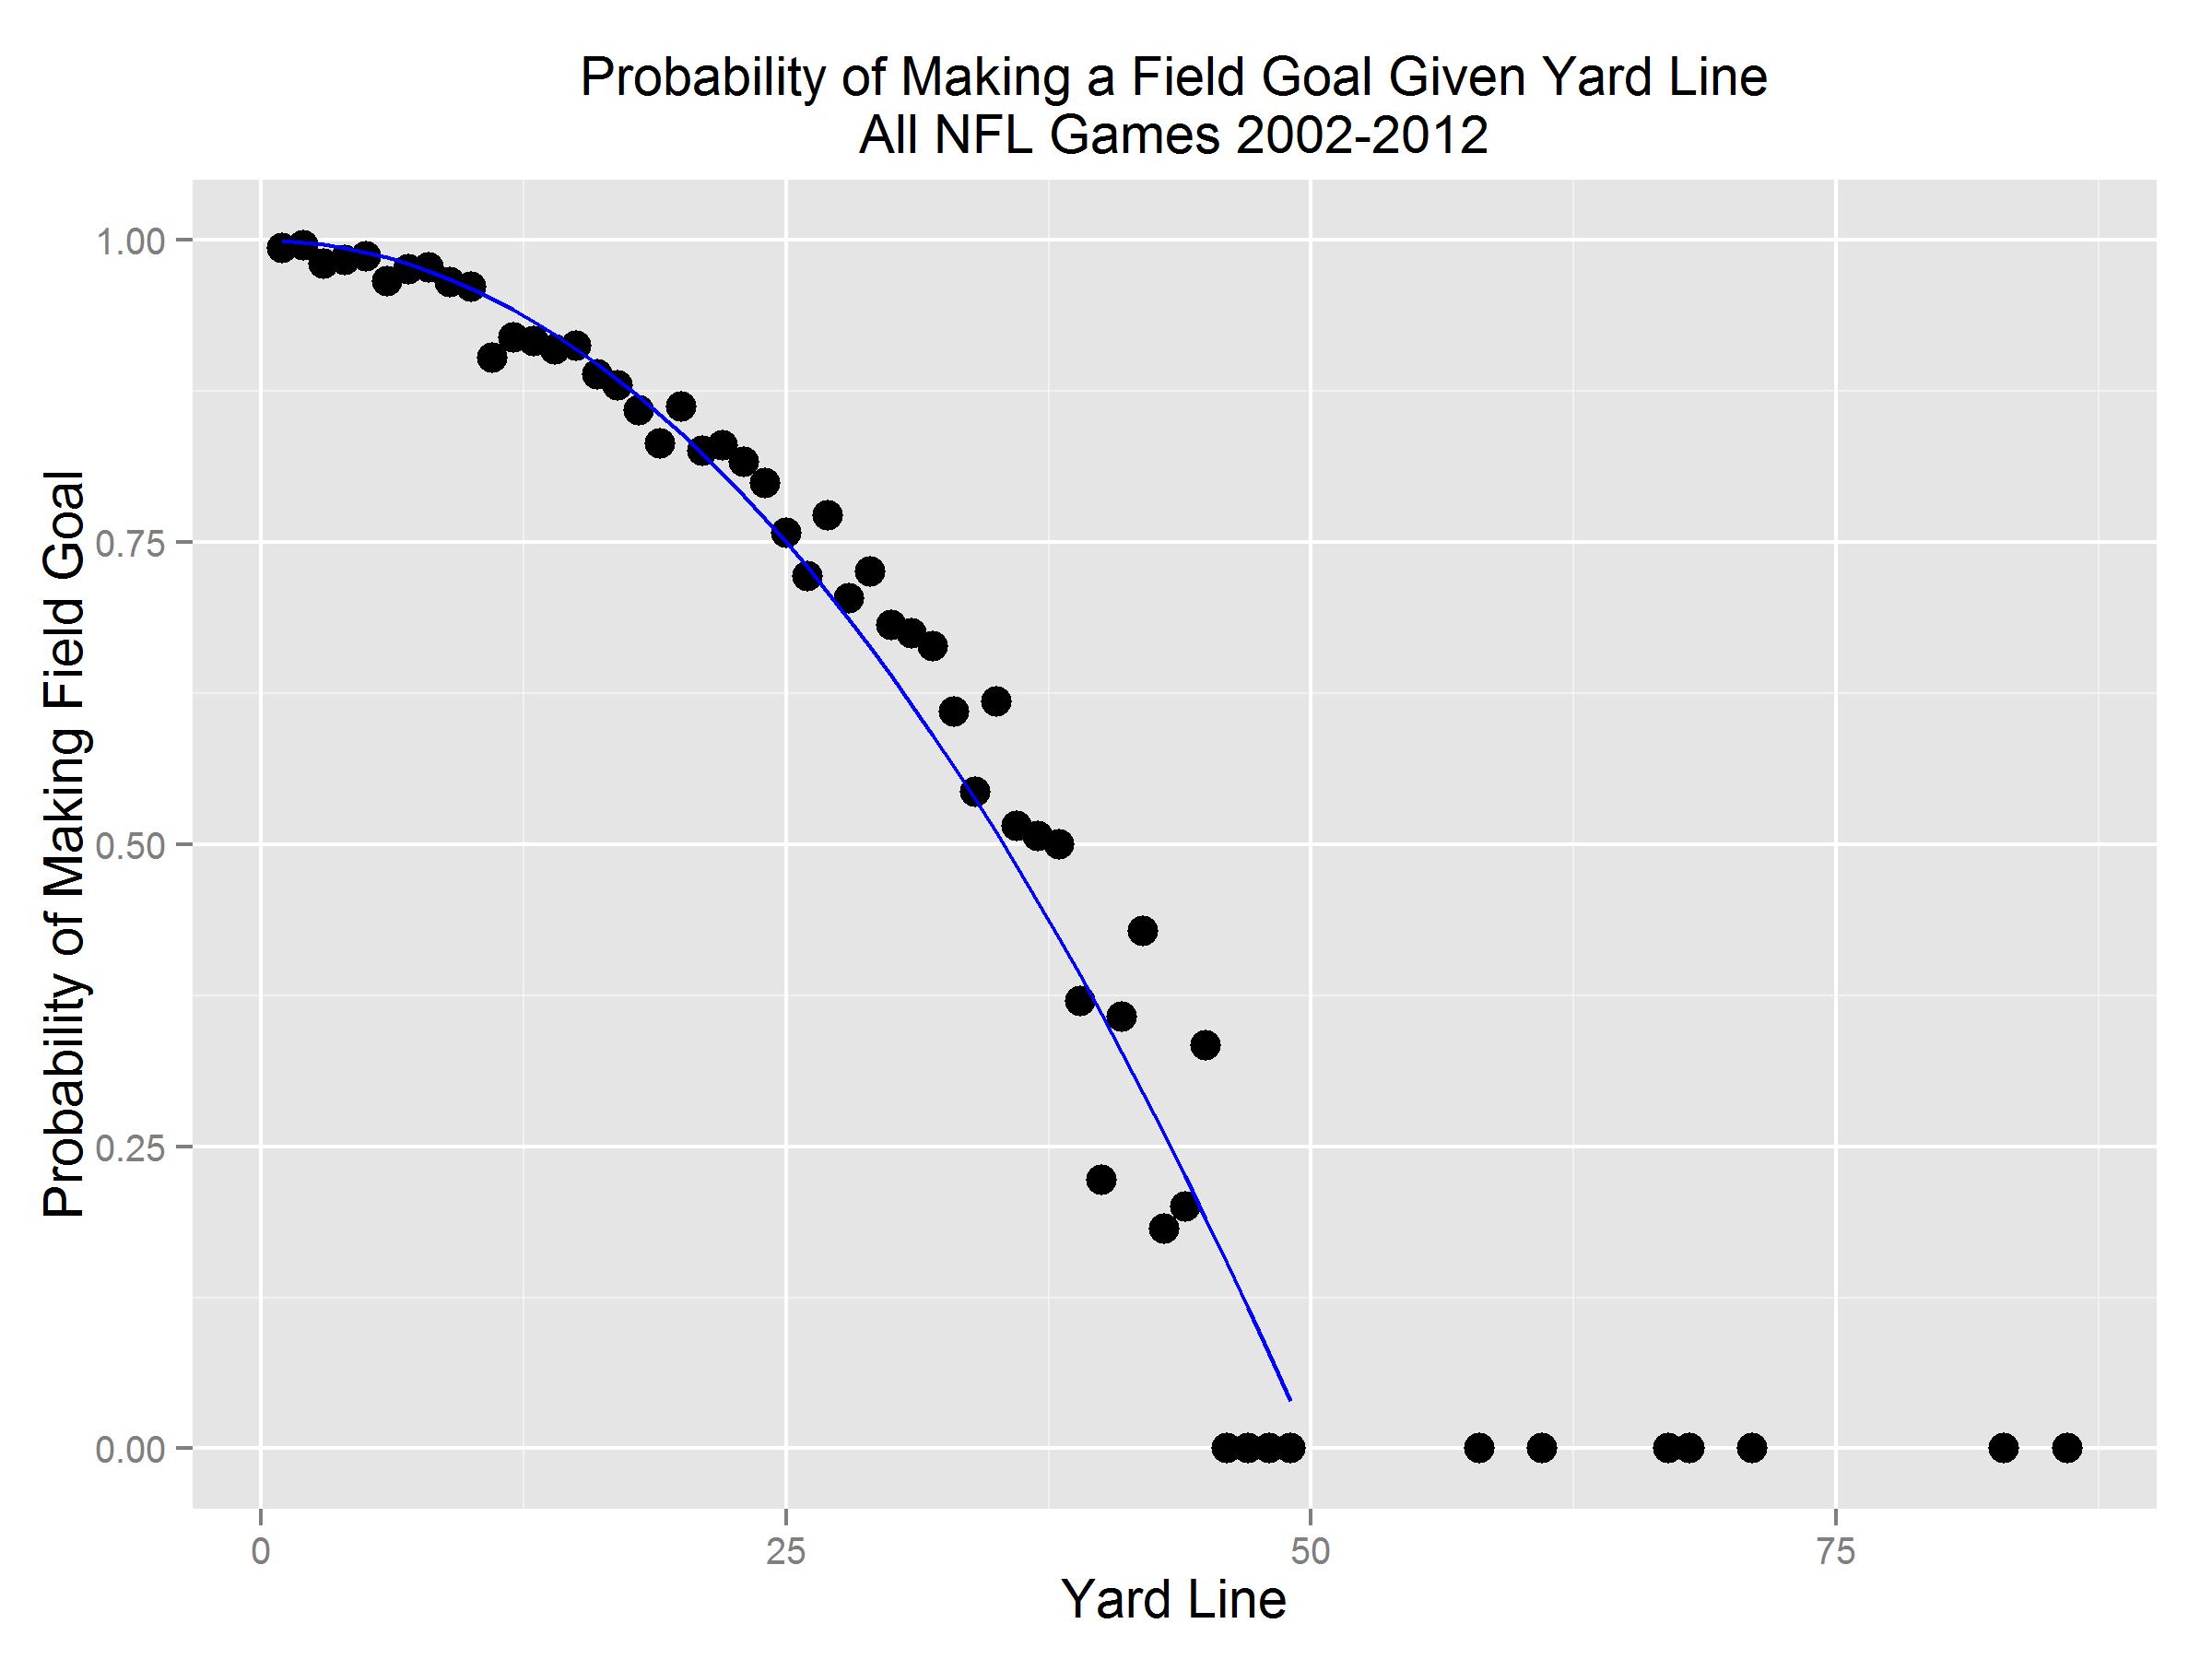 FG-ProbMakingFieldGoalGivenDistance.model.s